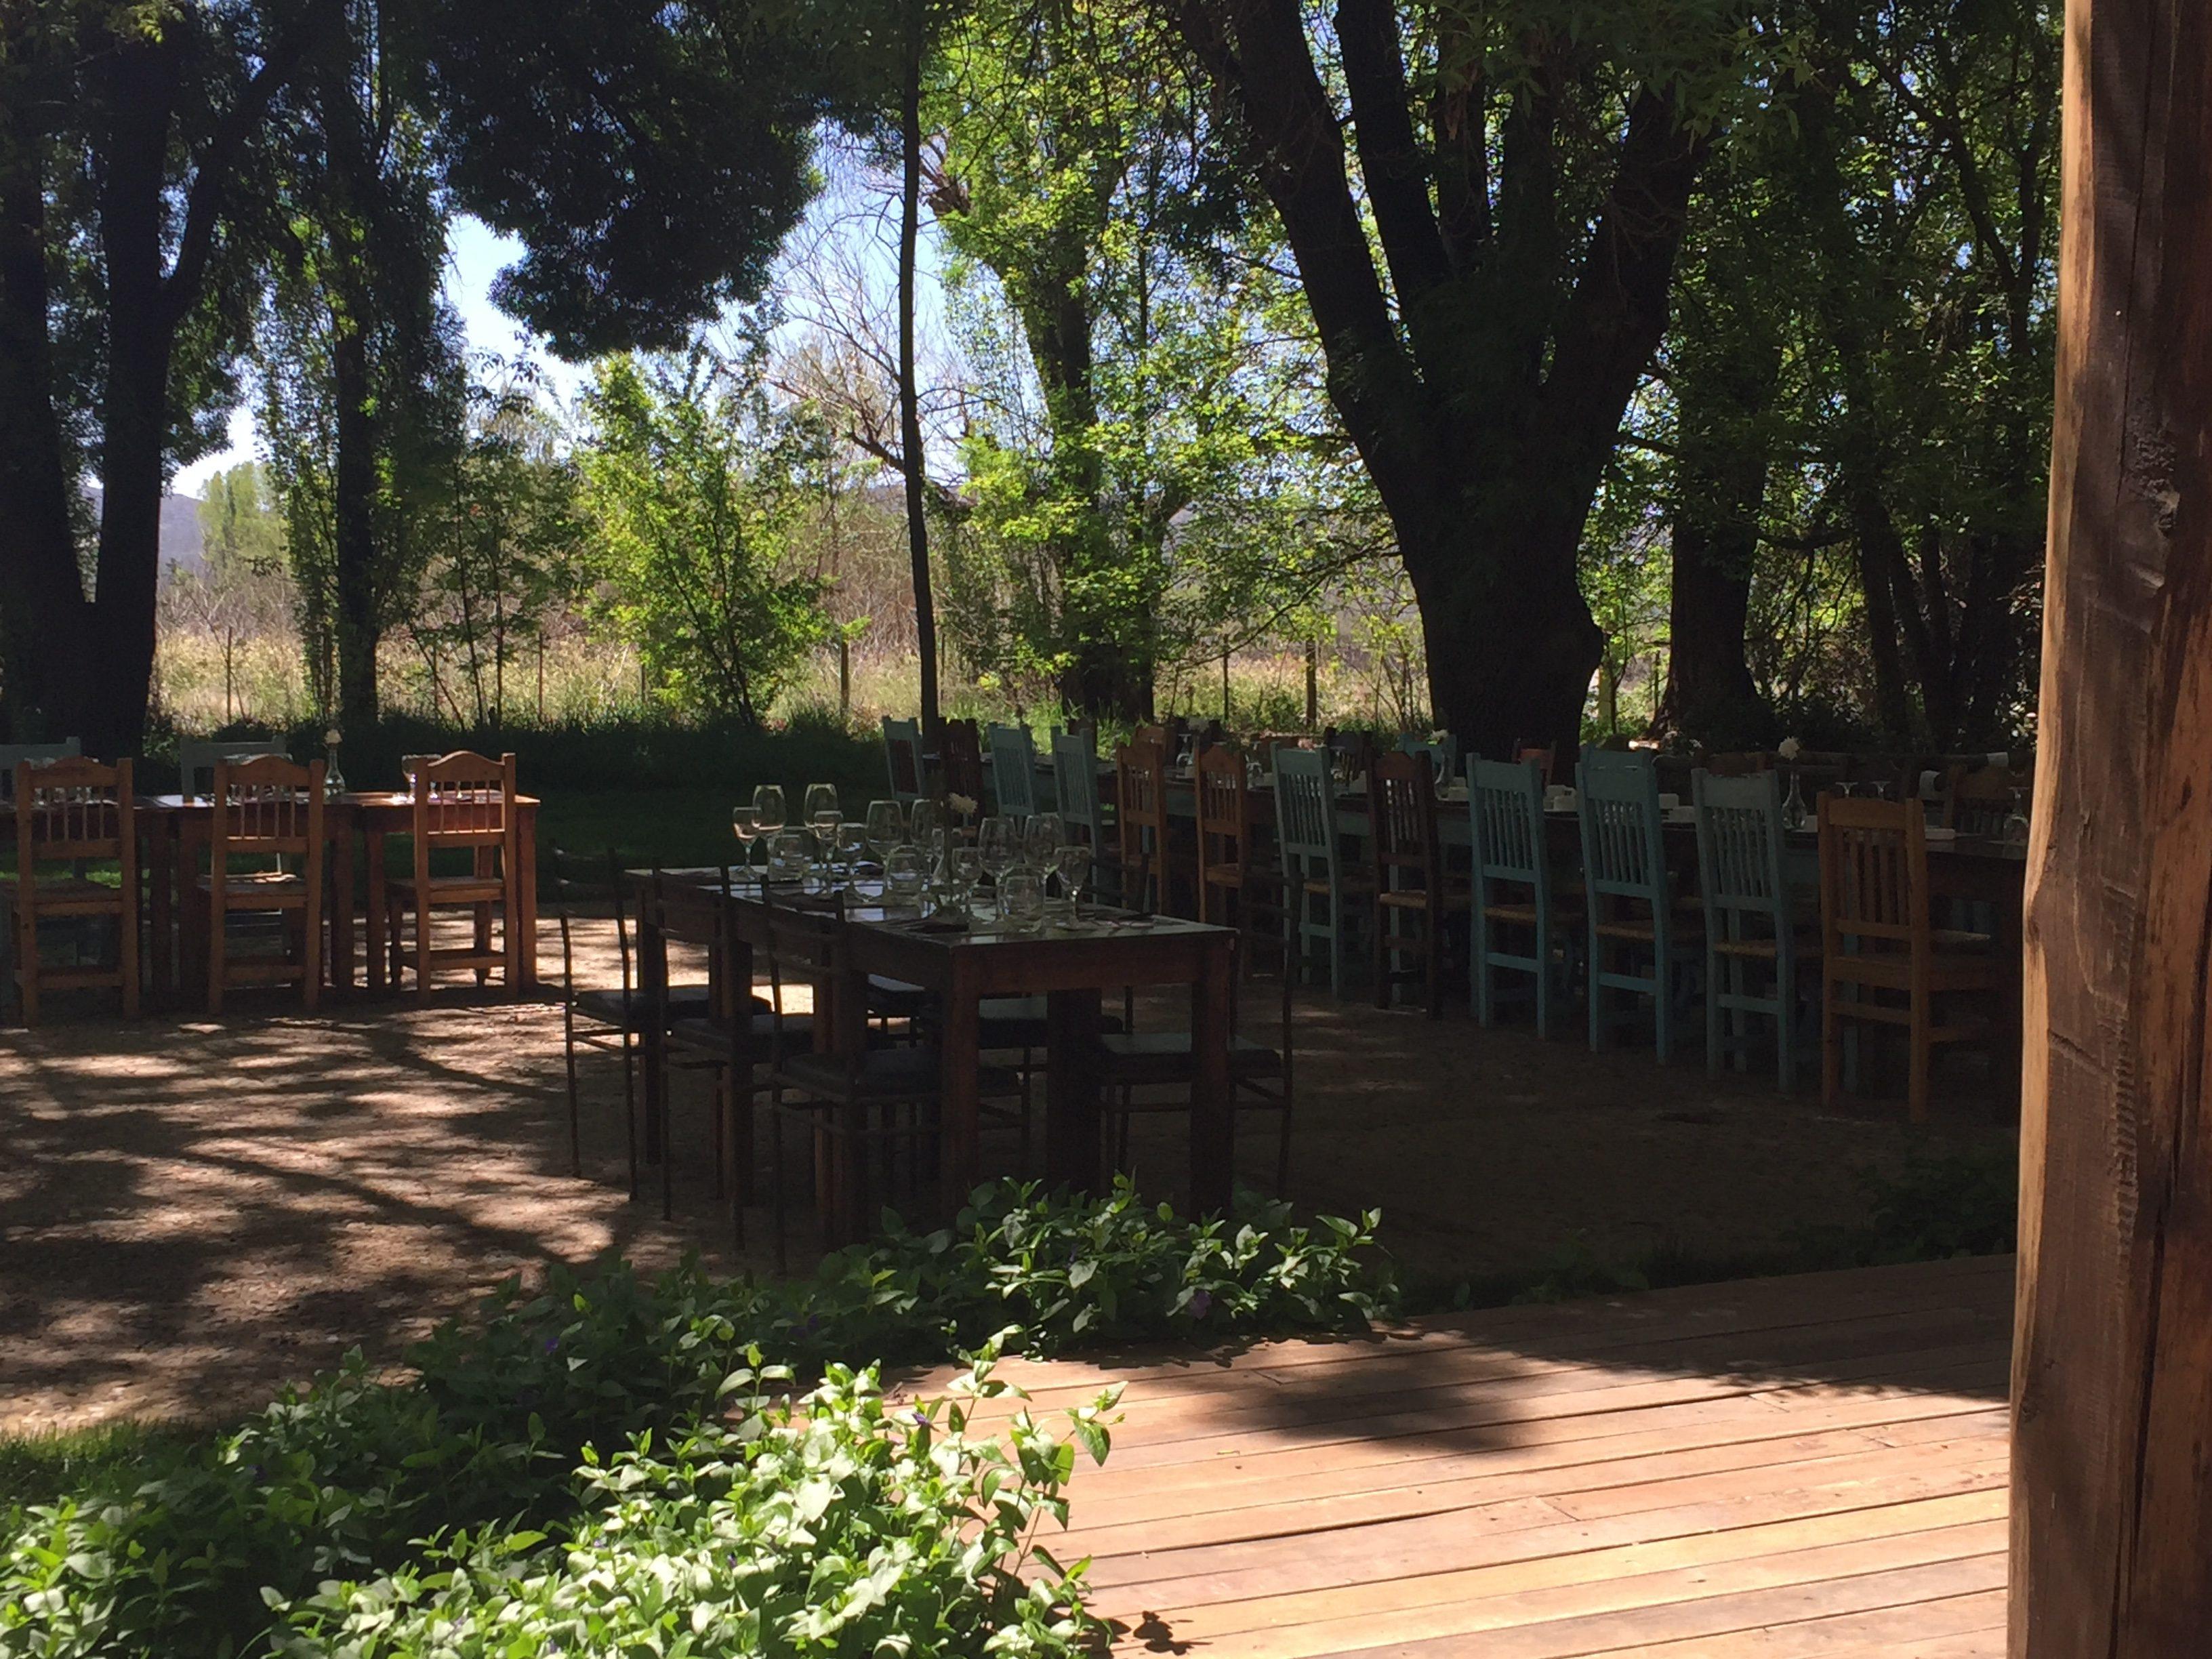 IMG 8361 e1508807108655 - Almorzando en la Bodega Atamisque de Mendoza